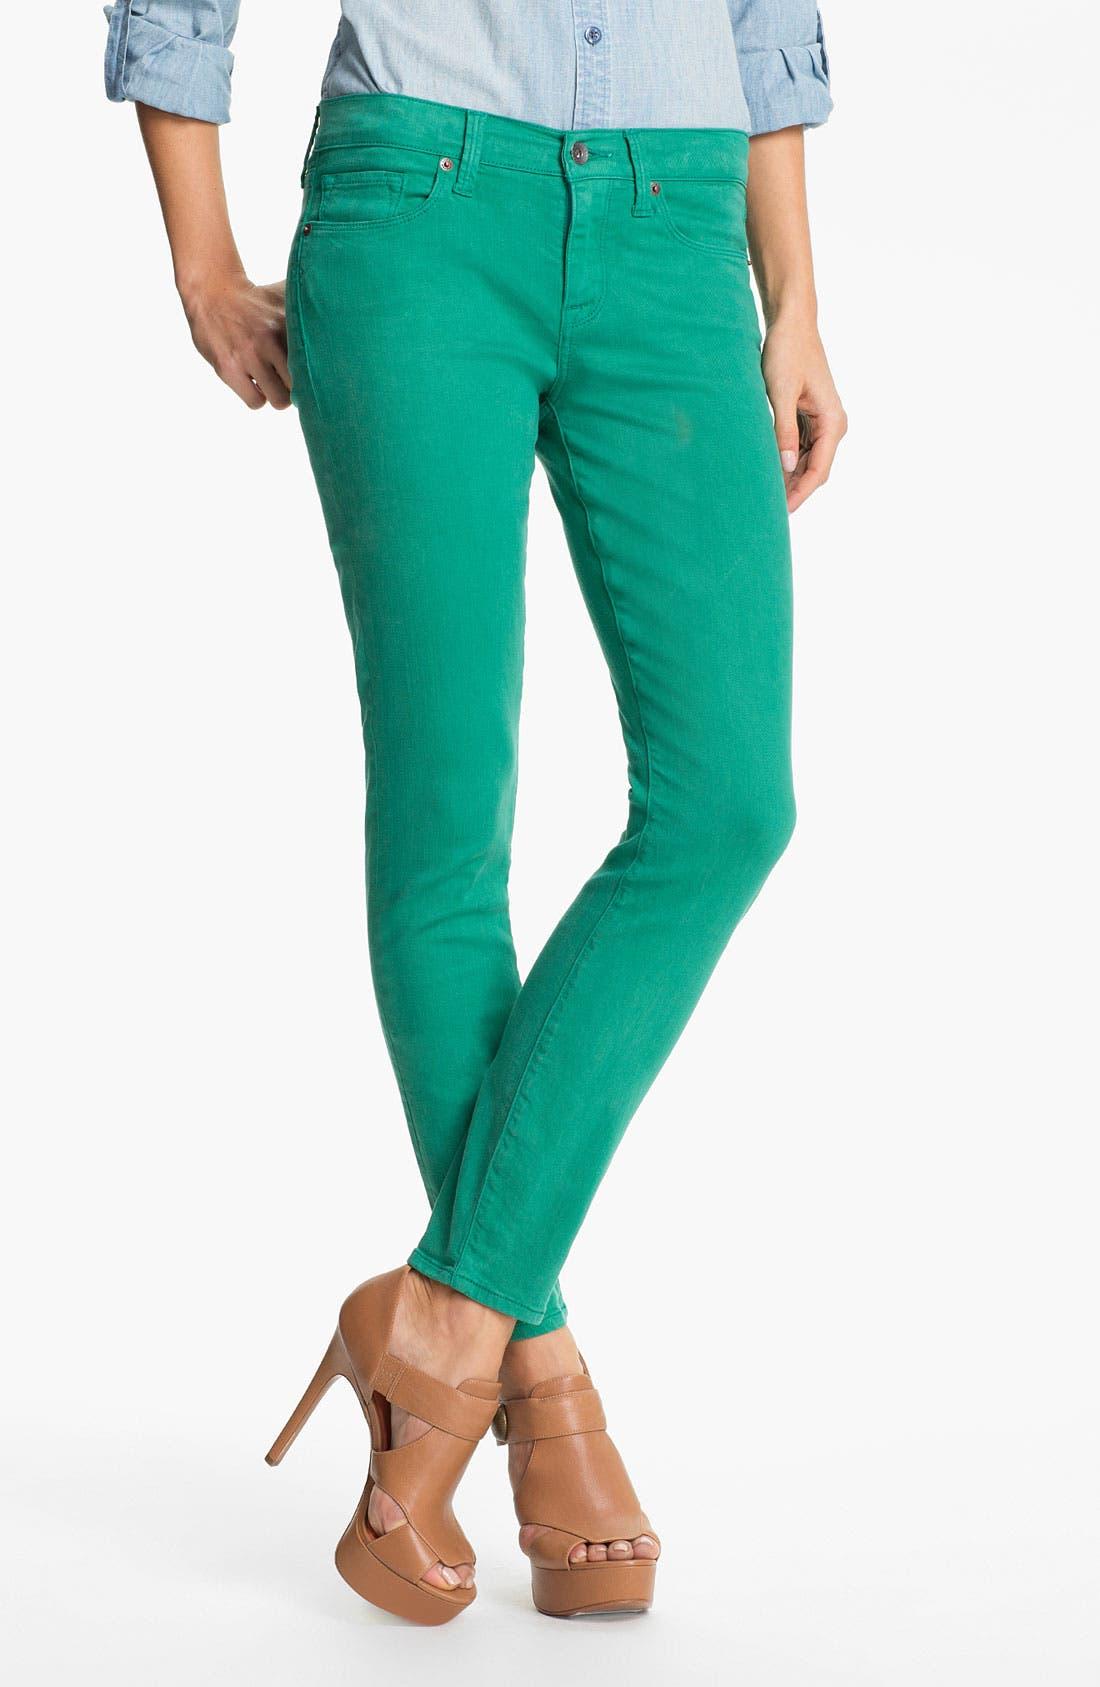 Alternate Image 1 Selected - Lucky Brand 'Sofia' Colored Denim Skinny Jeans